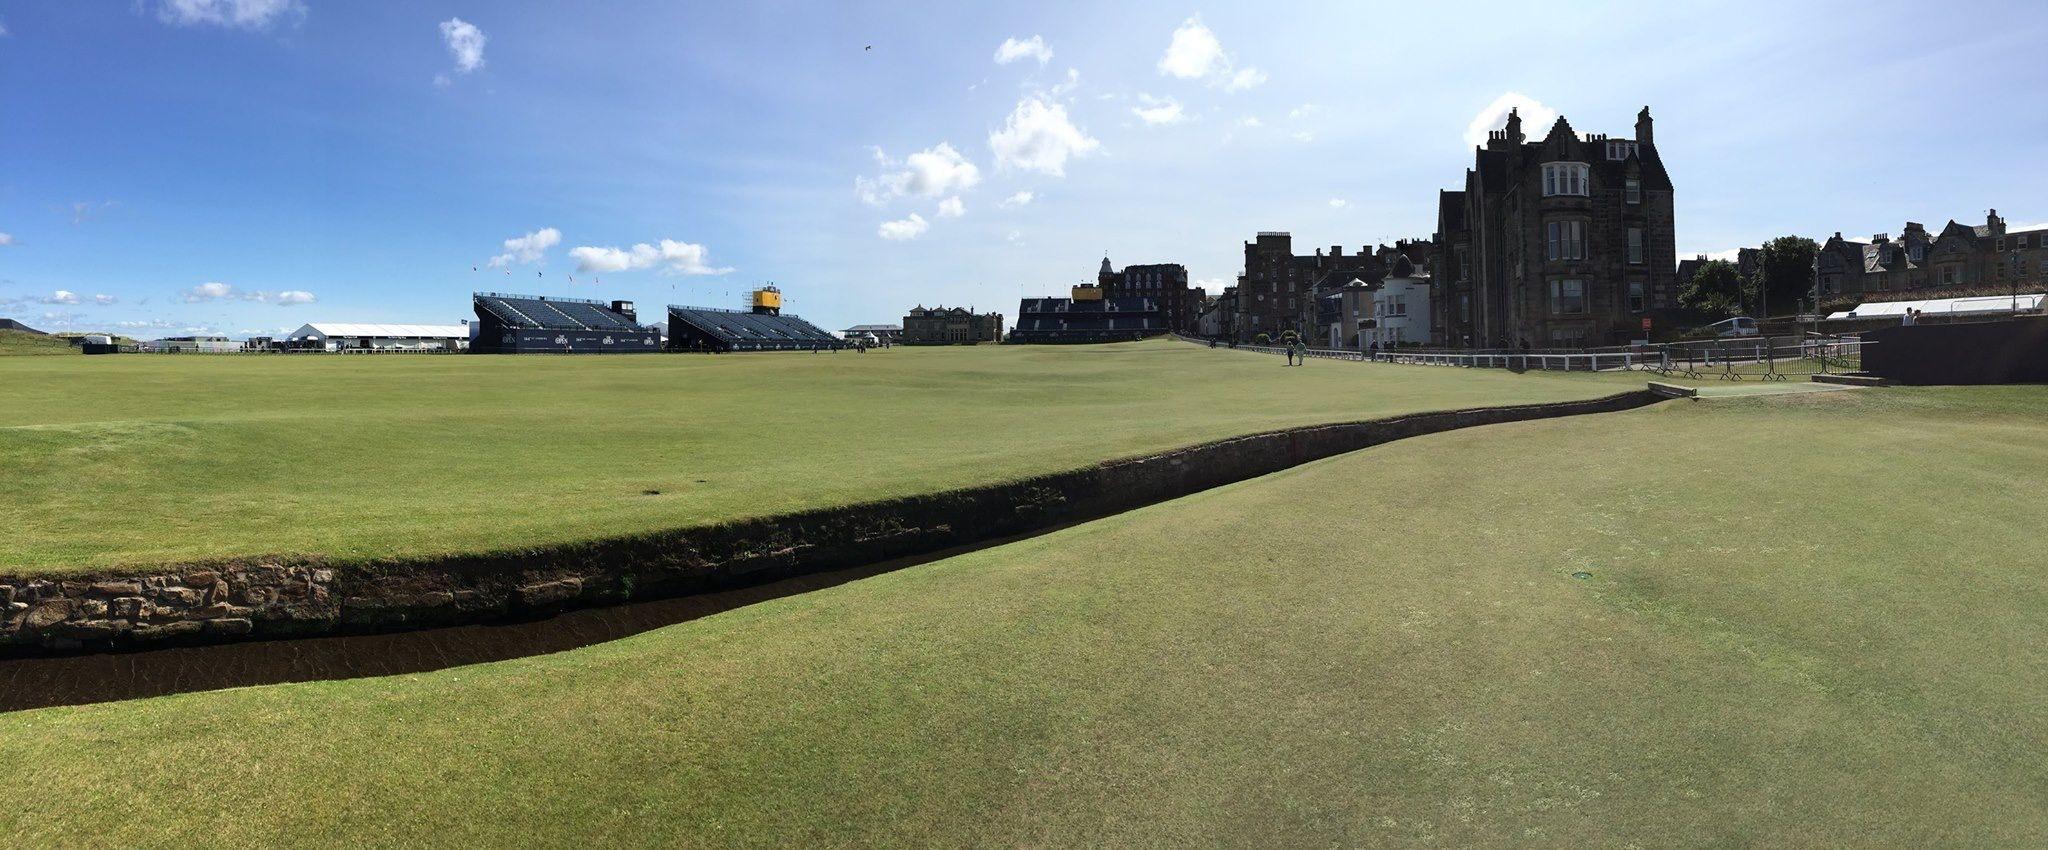 St. Andrew's golf course, Scotland